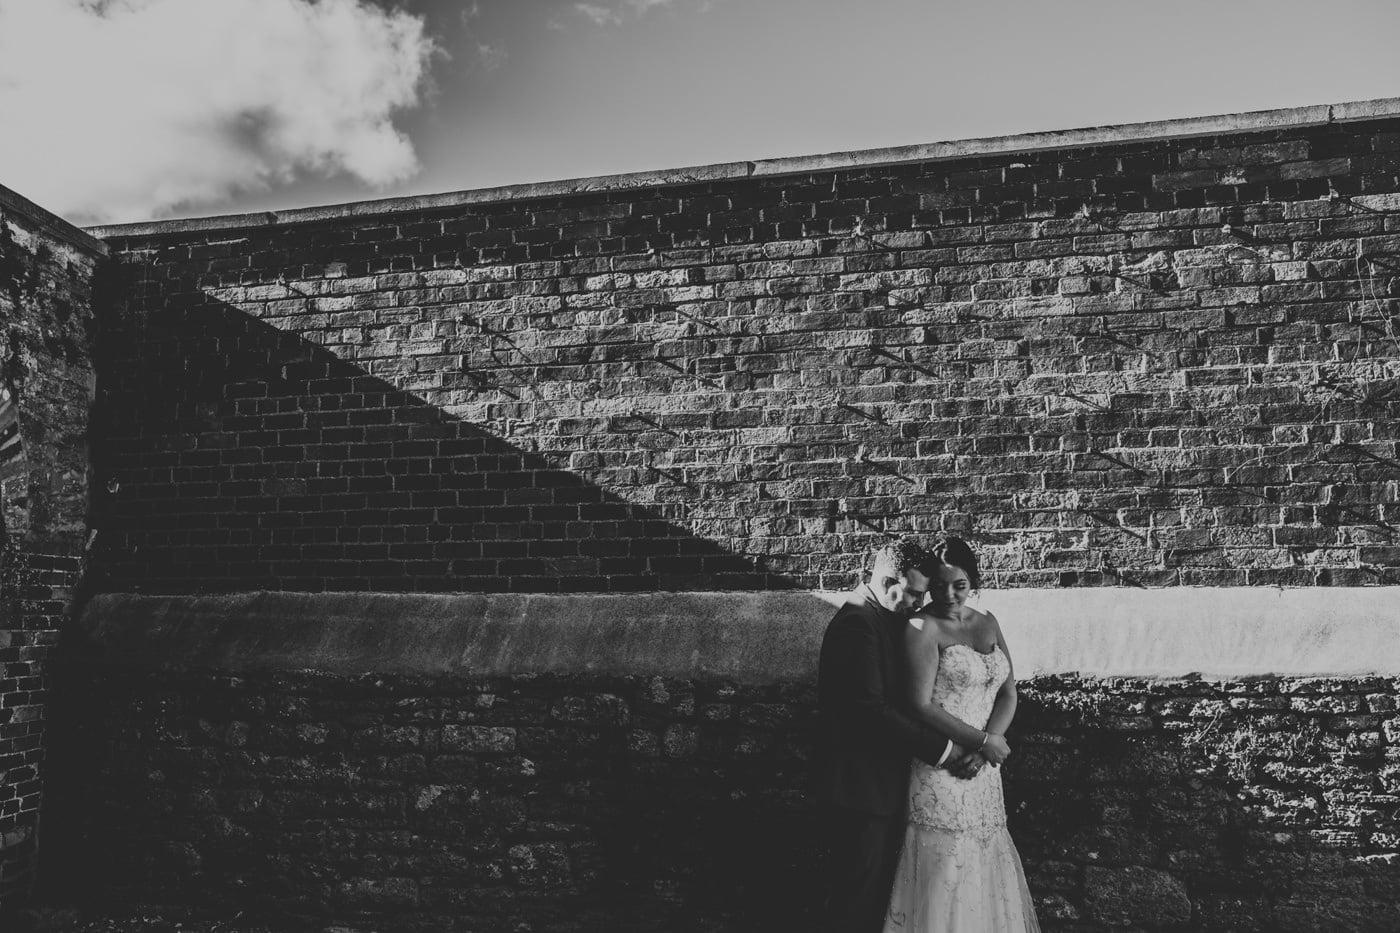 Leanne and Scott / Elmhay Park, Somerset 2